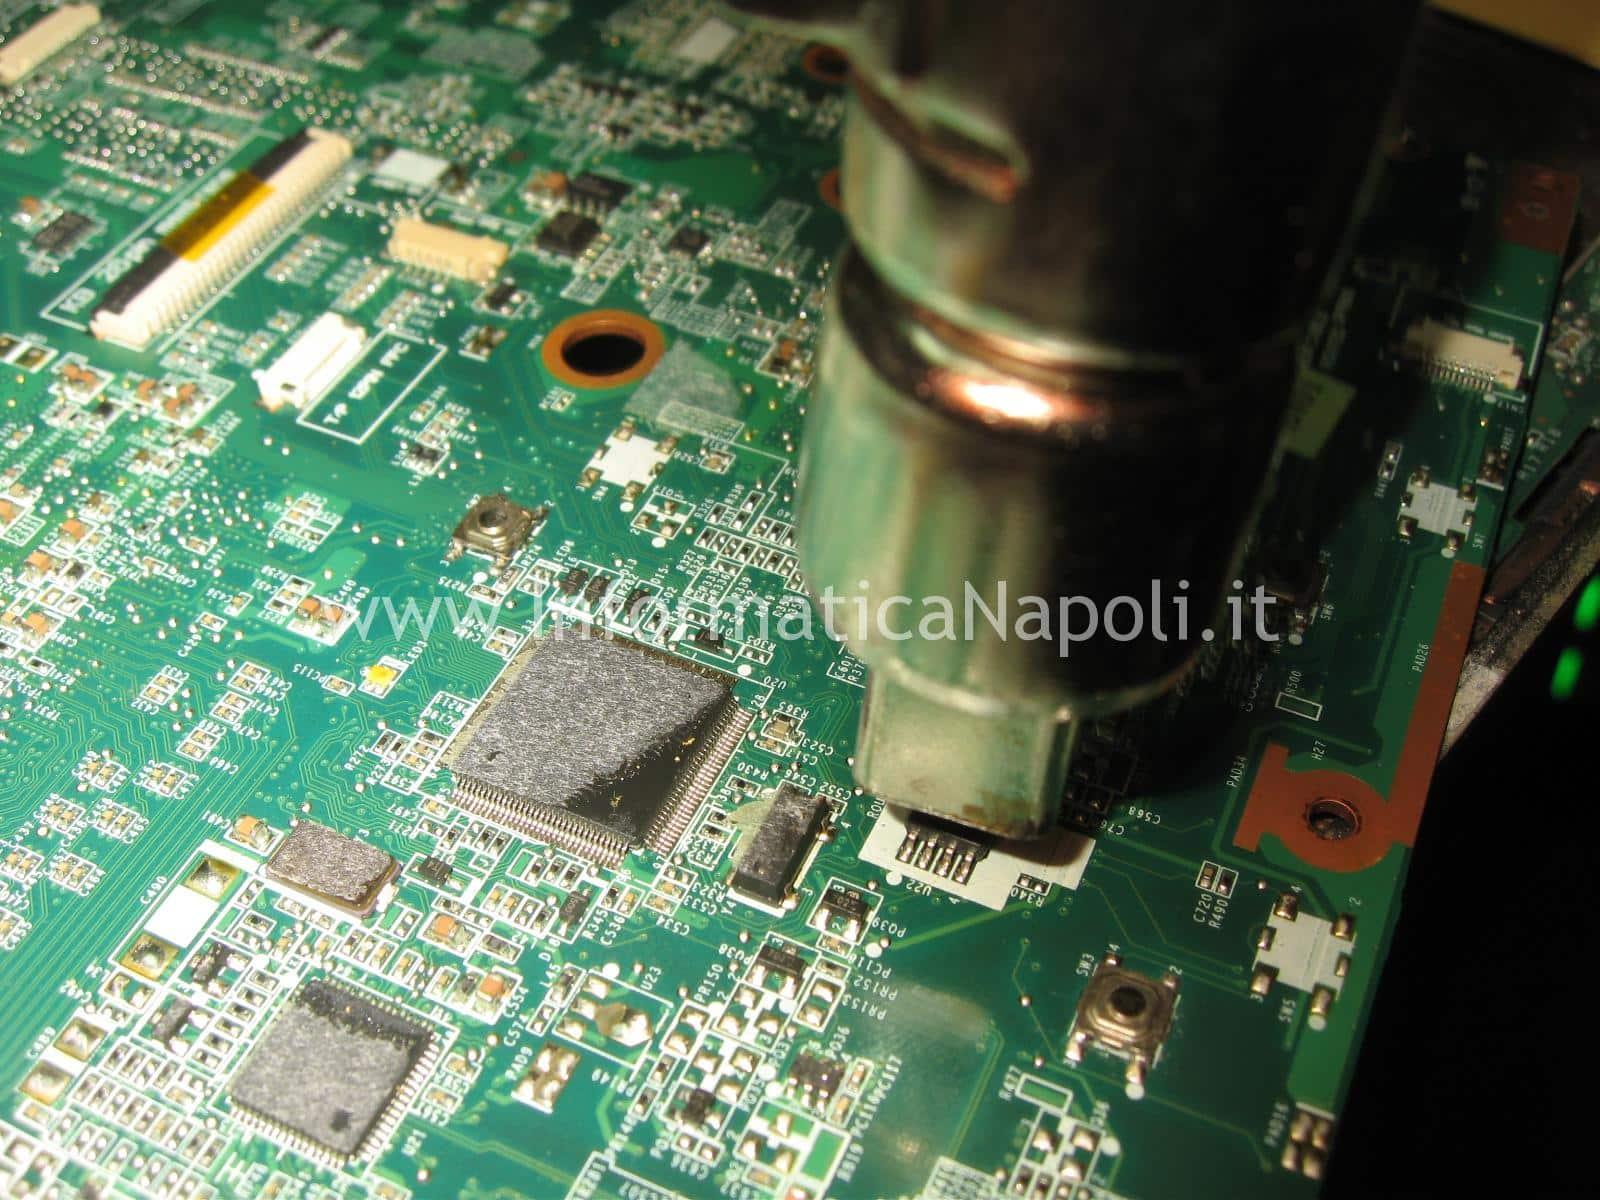 programmare bios Macronix MX25L644 ASUSPRO P2520L P552LA_LJ